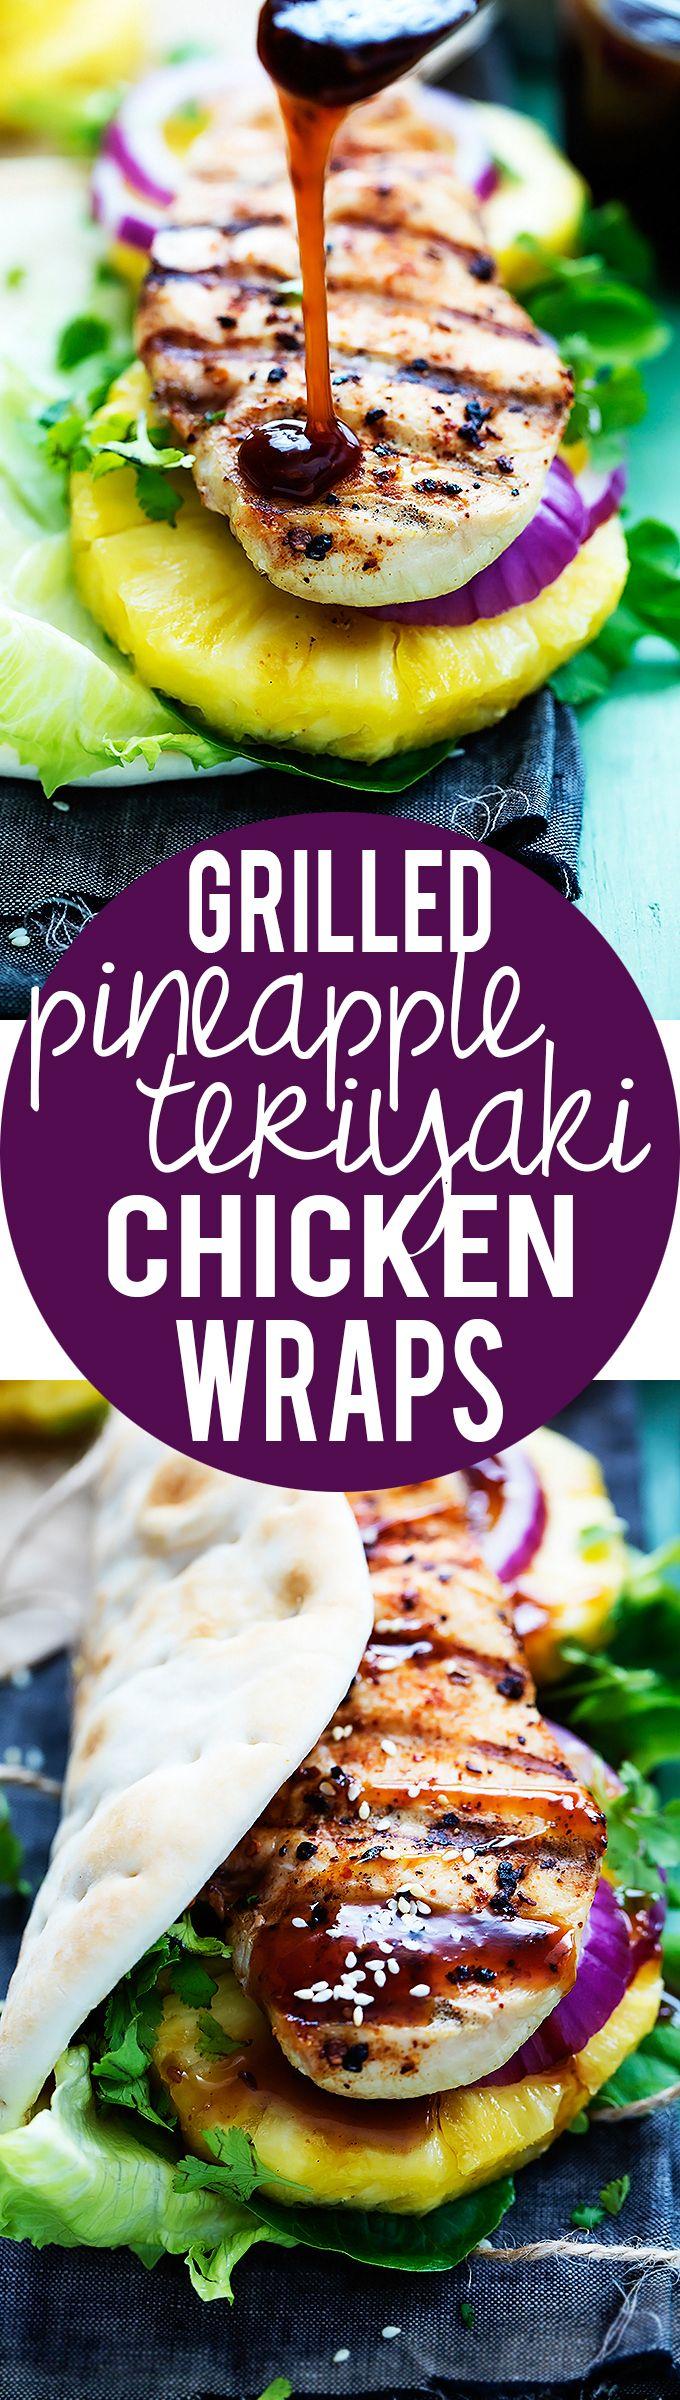 Sub Gardein Chix=Vegan! Grilled Pineapple Chicken Teriyaki Wraps | Creme de la Crumb